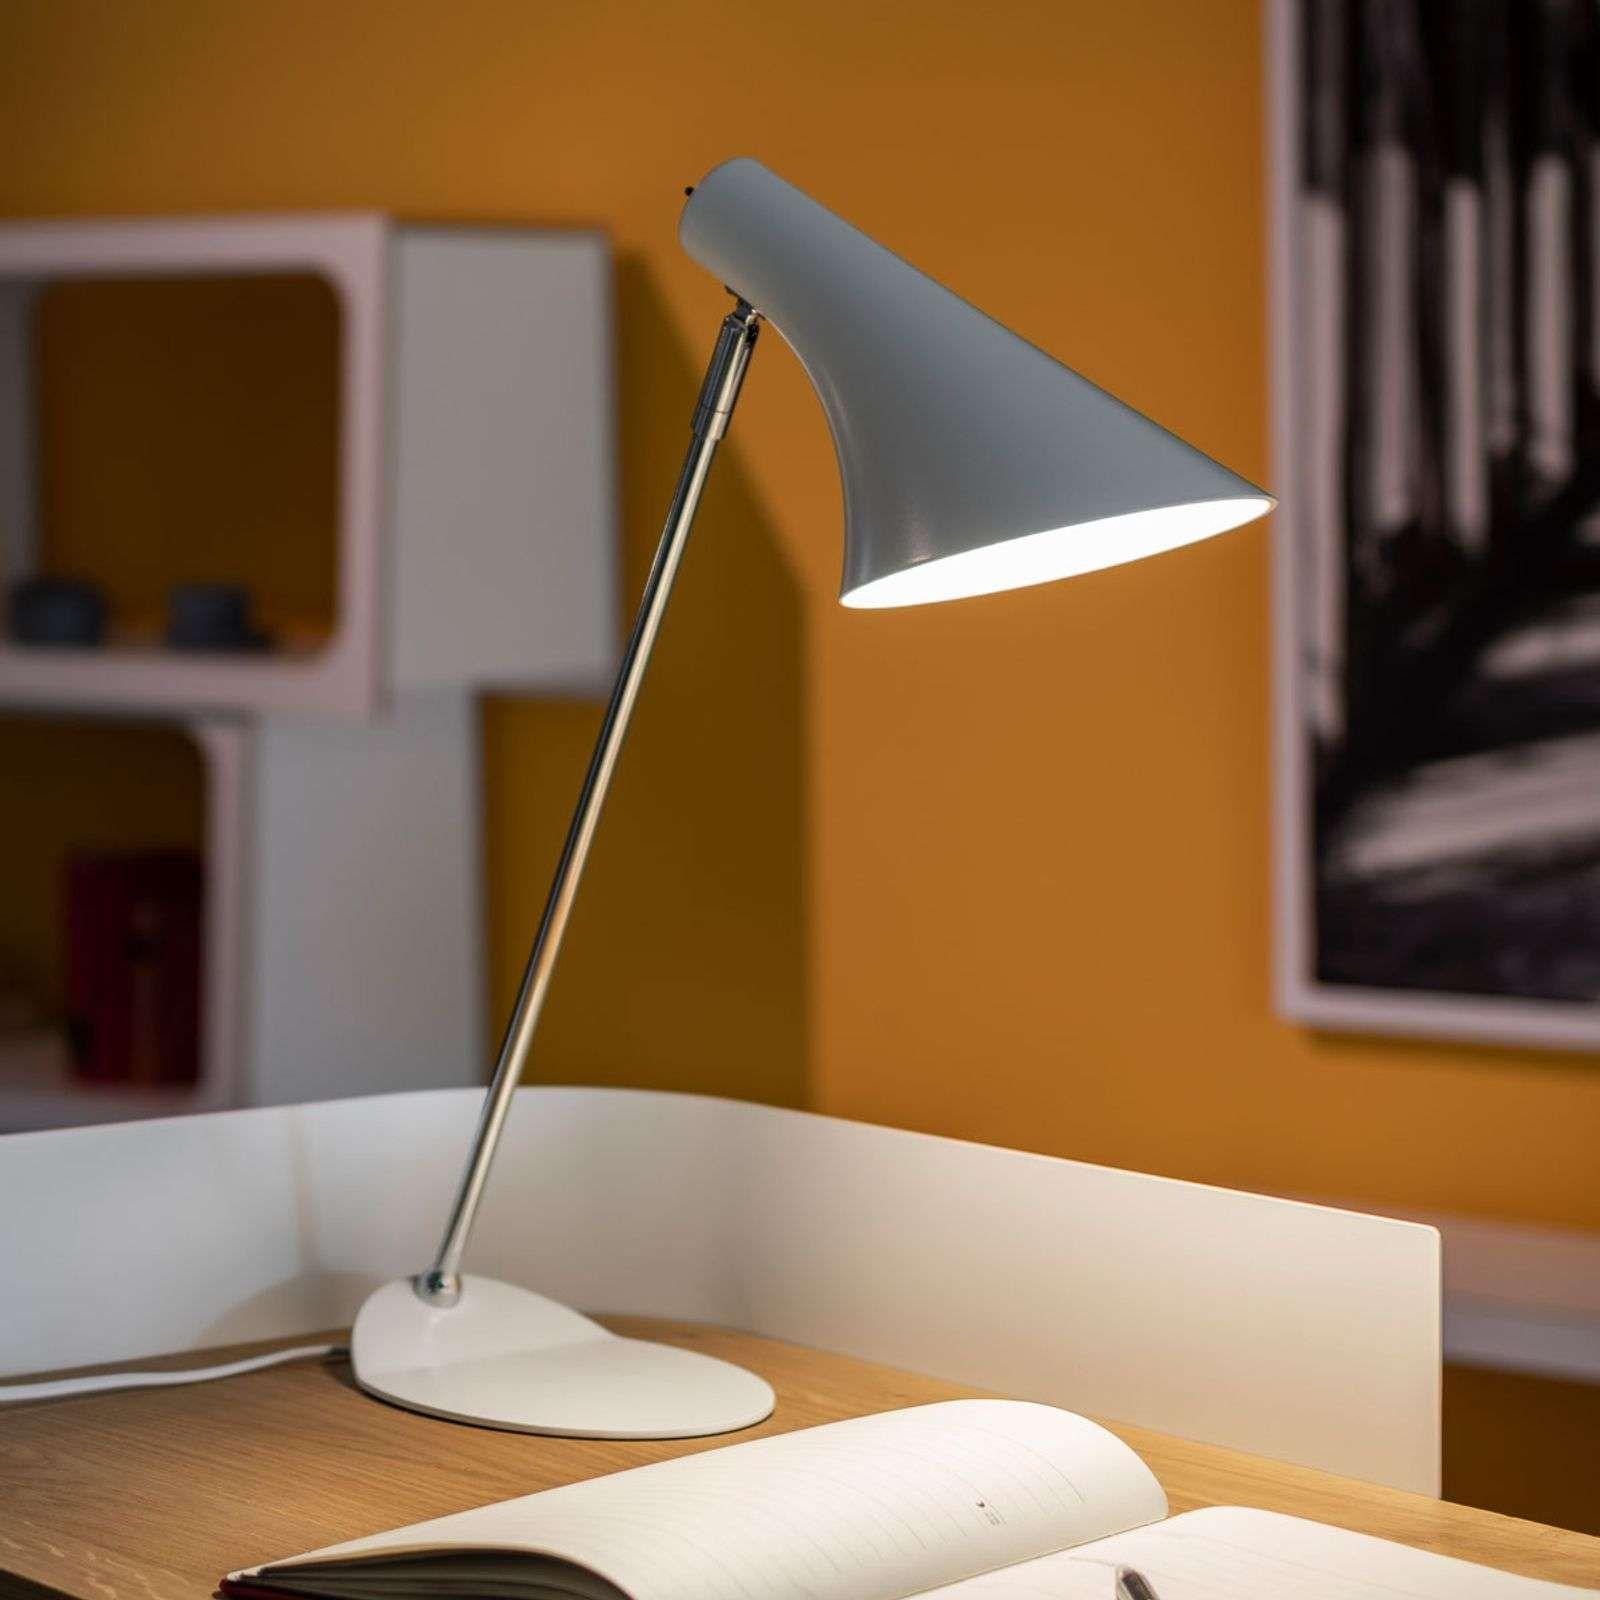 Lampe De Bureau Tendance Liam Blanche In 2020 Flexible Floor Lamp Table Lamp Desk Lamp